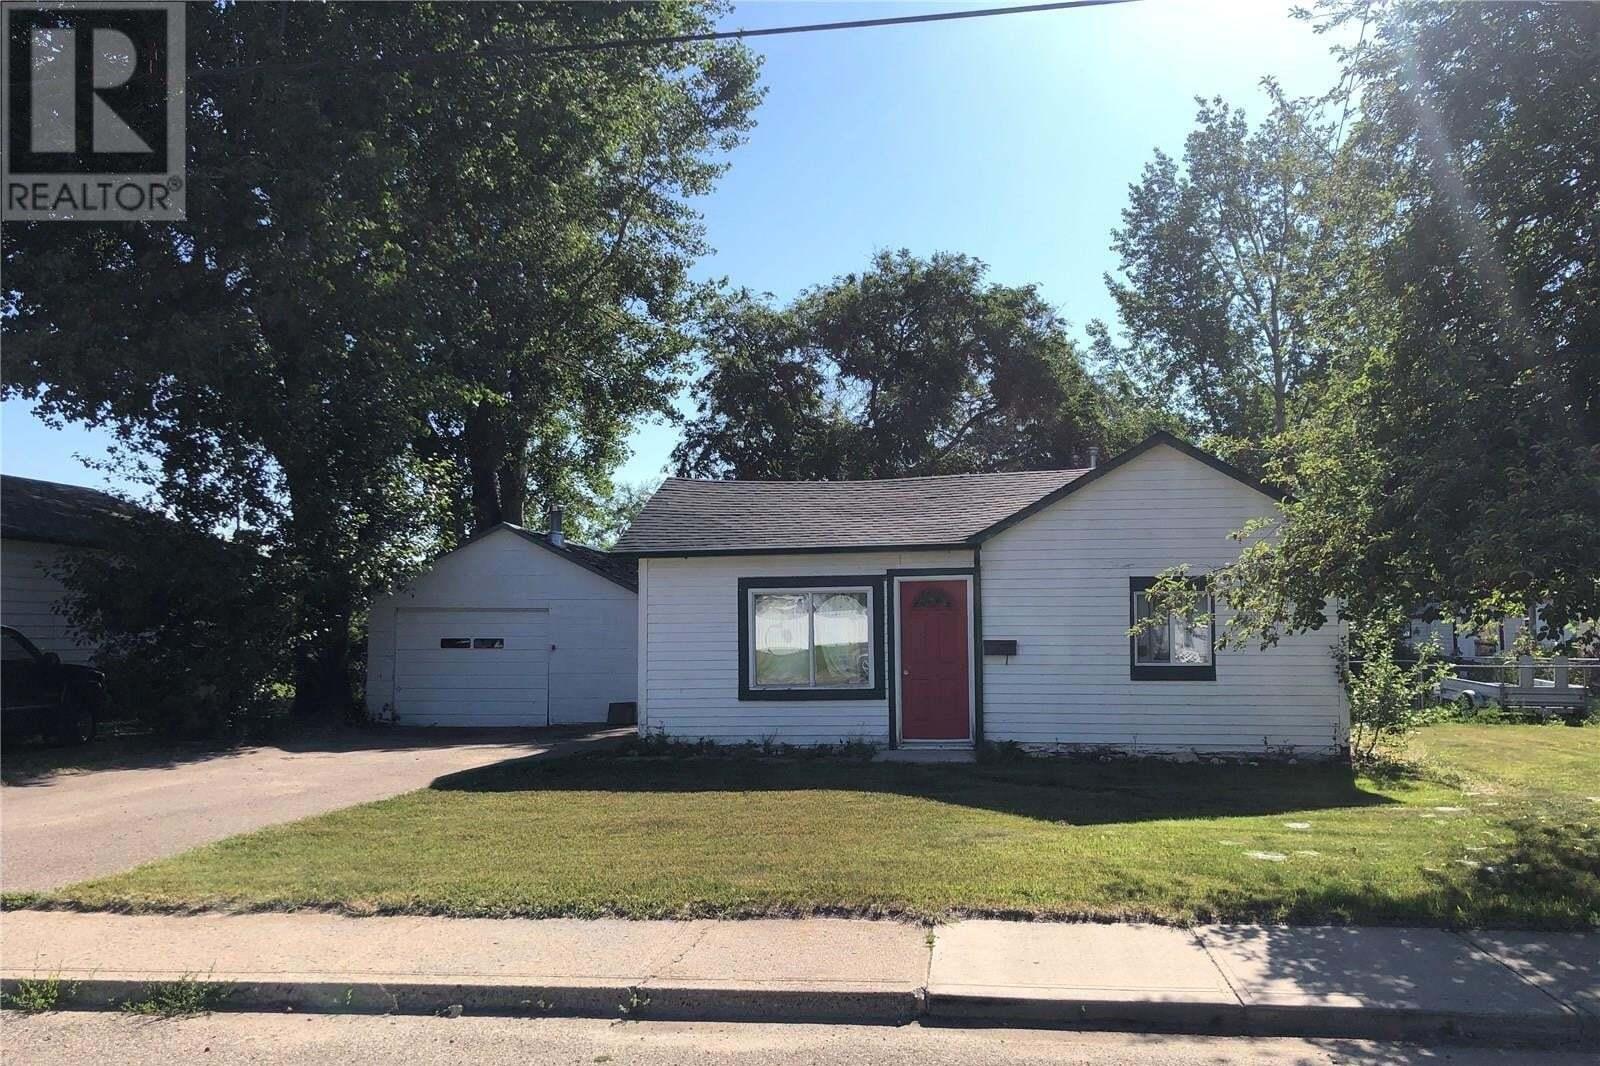 House for sale at 167 11th Ave SE Swift Current Saskatchewan - MLS: SK819153